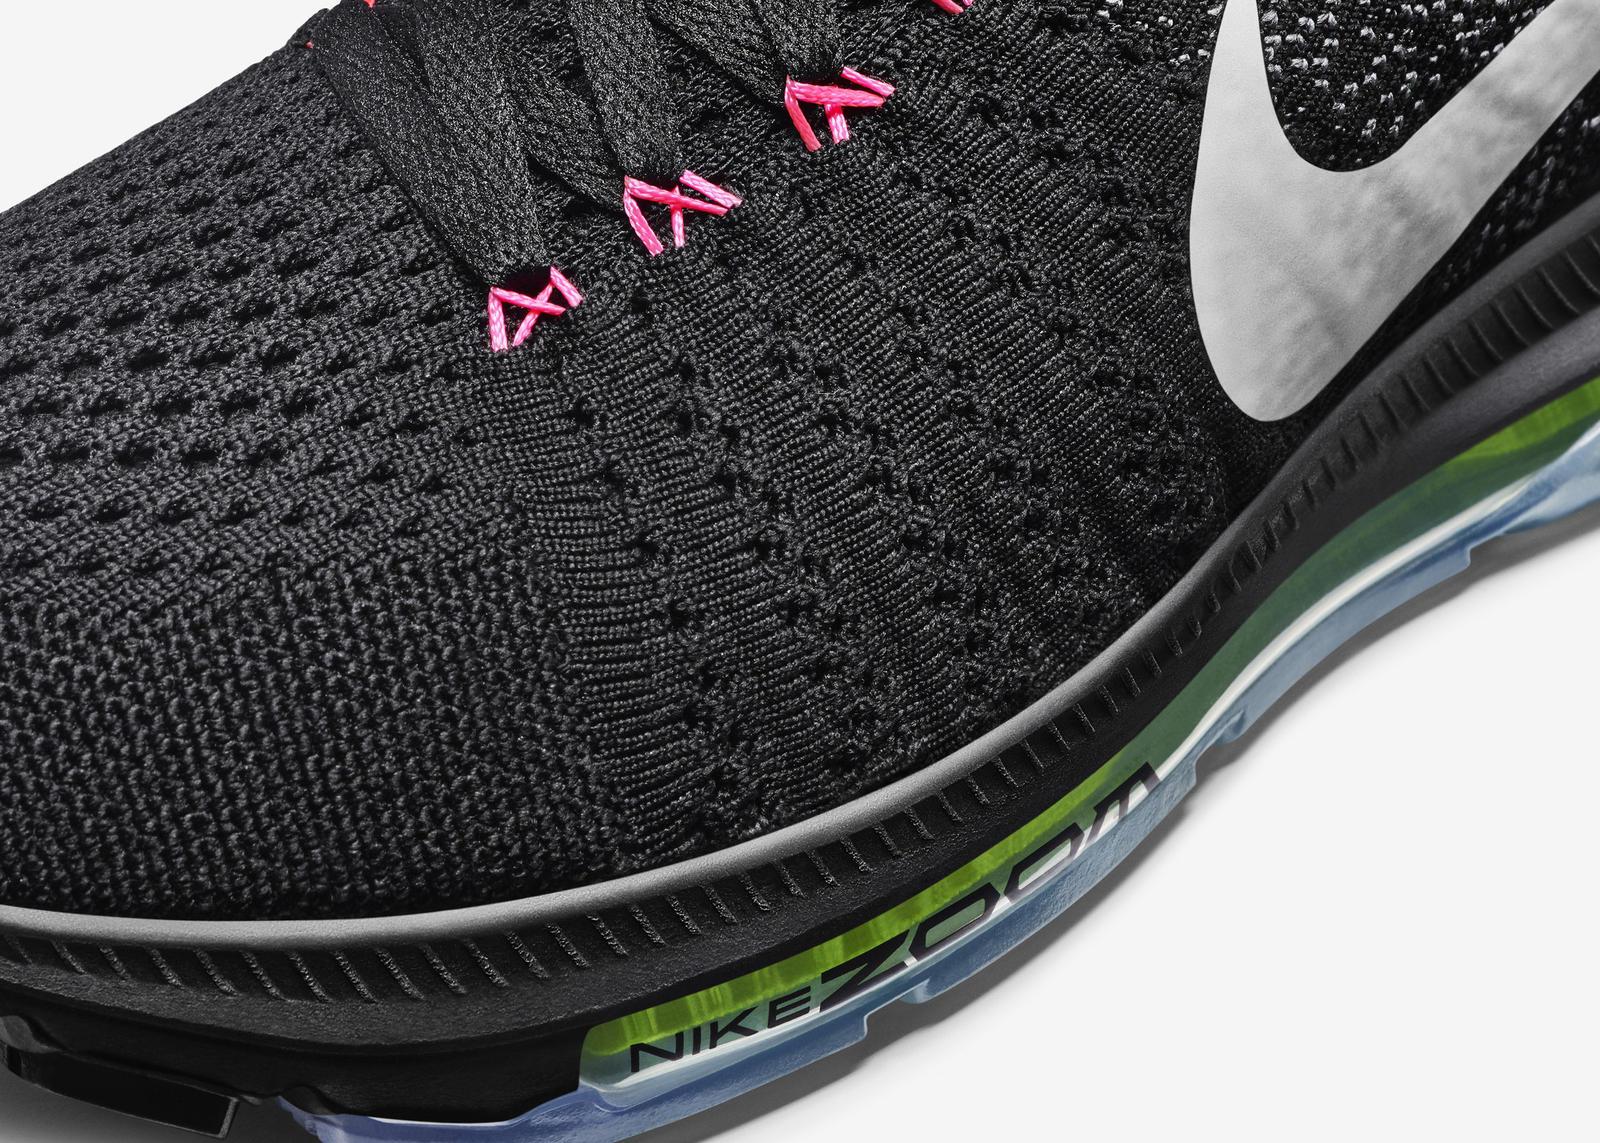 6dc3a84e1325 Full Speed Ahead - Nike News